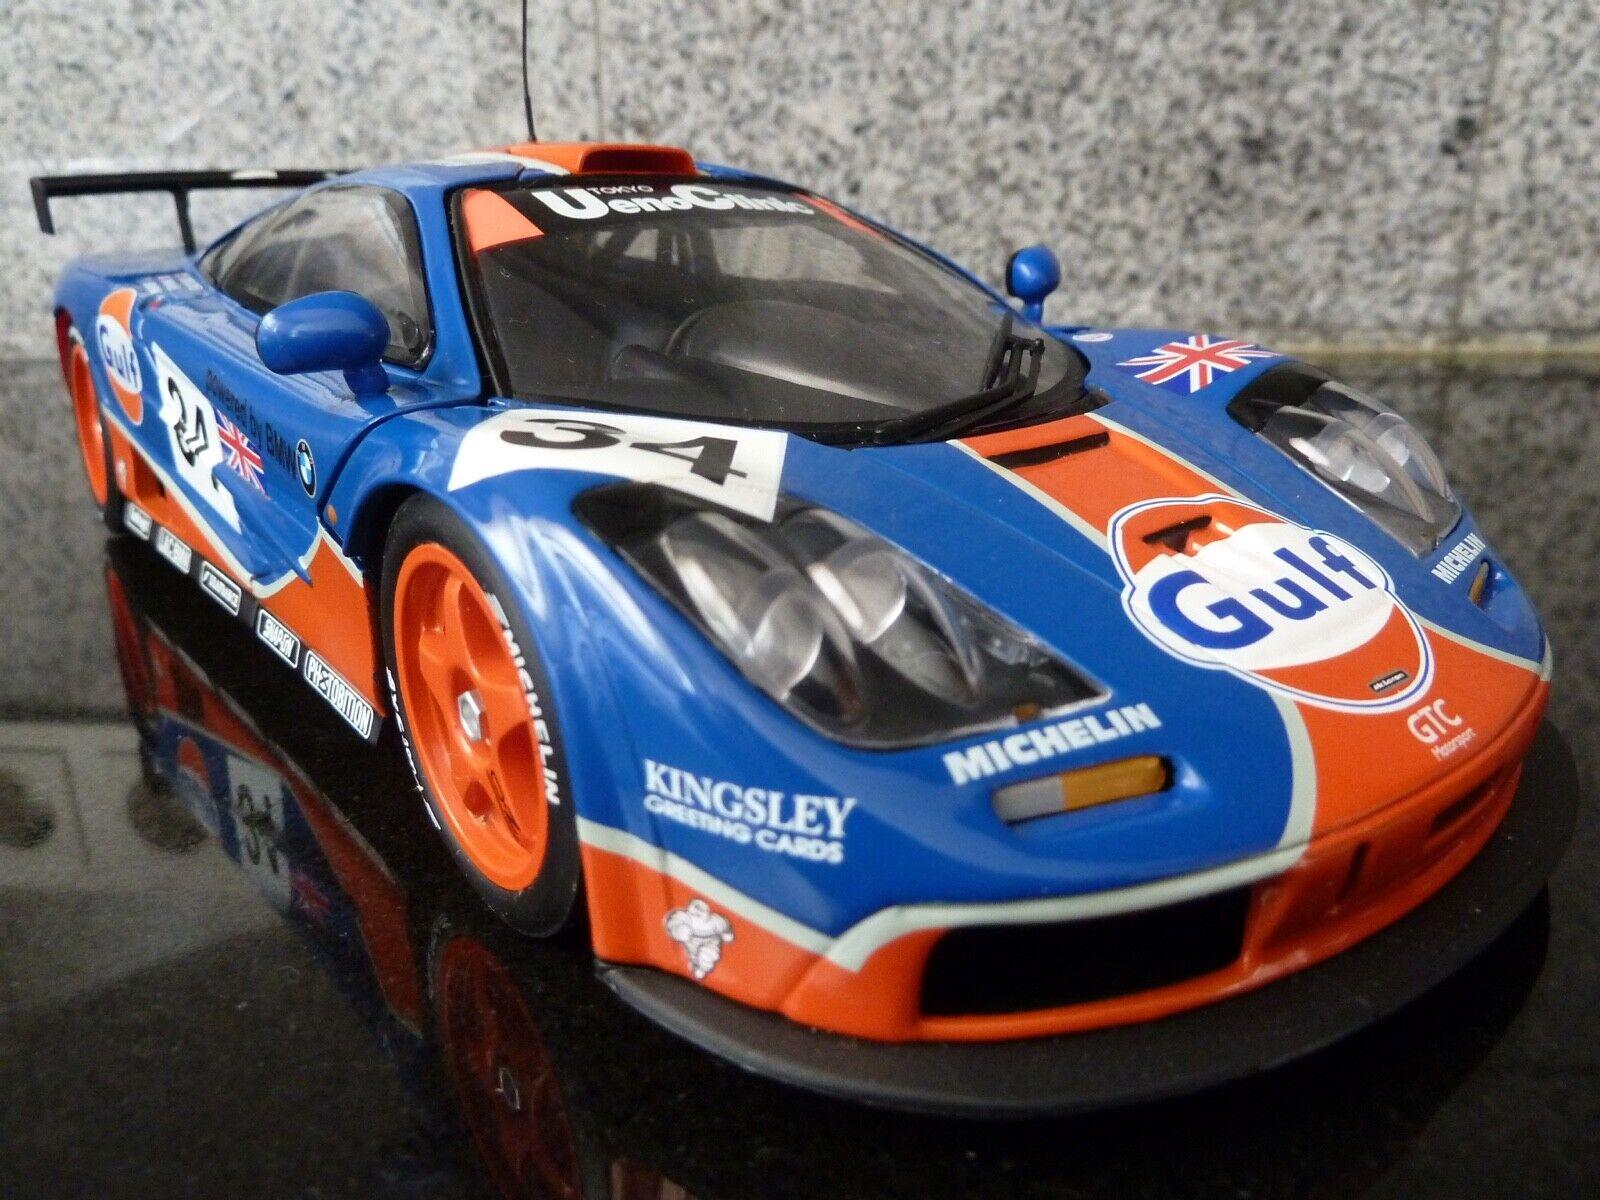 1 18 ut, McLaren f1 GTR, Gulf, Le Mans 96